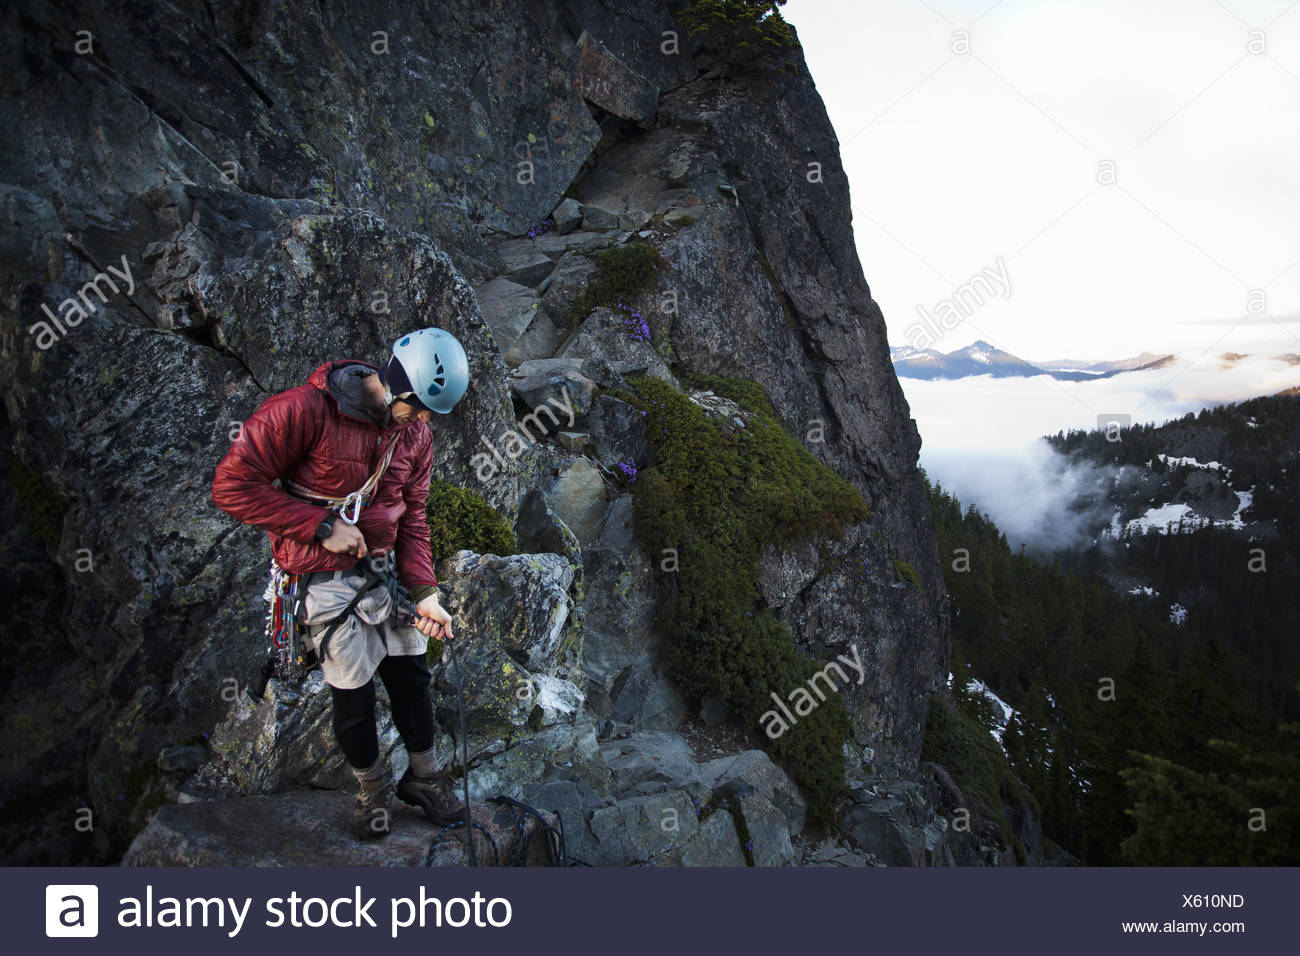 Washington state USA rock climber stands on the summit of peak - Stock Image